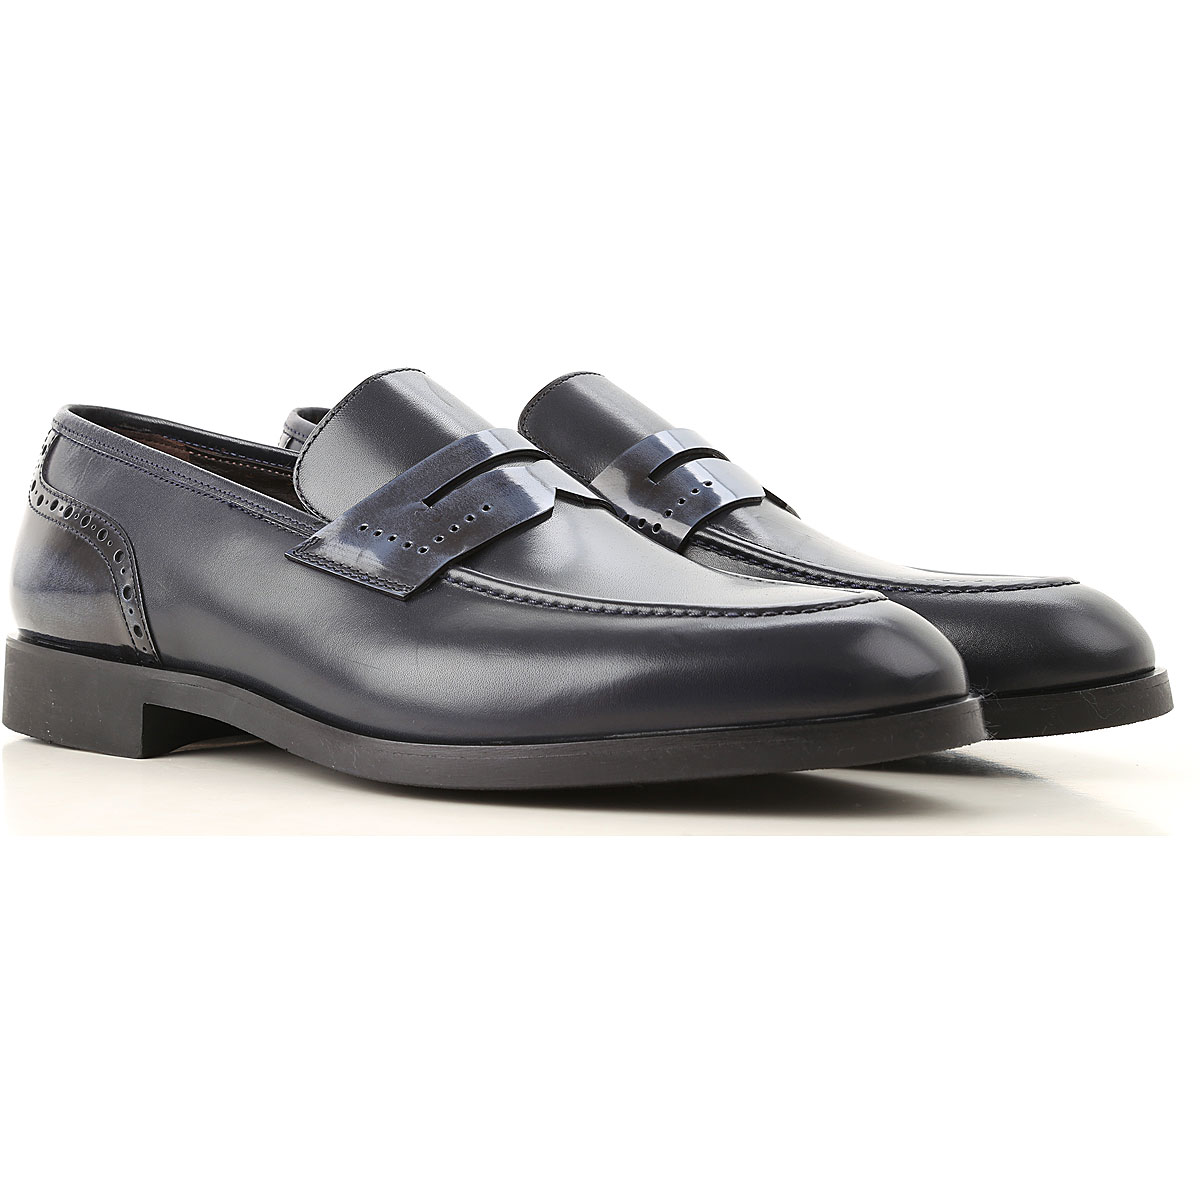 Image of Moreschi Loafers for Men, Dark Blue, Leather, 2017, 10 10.5 11 11.5 12 7 7.5 8 8.5 9 9.5